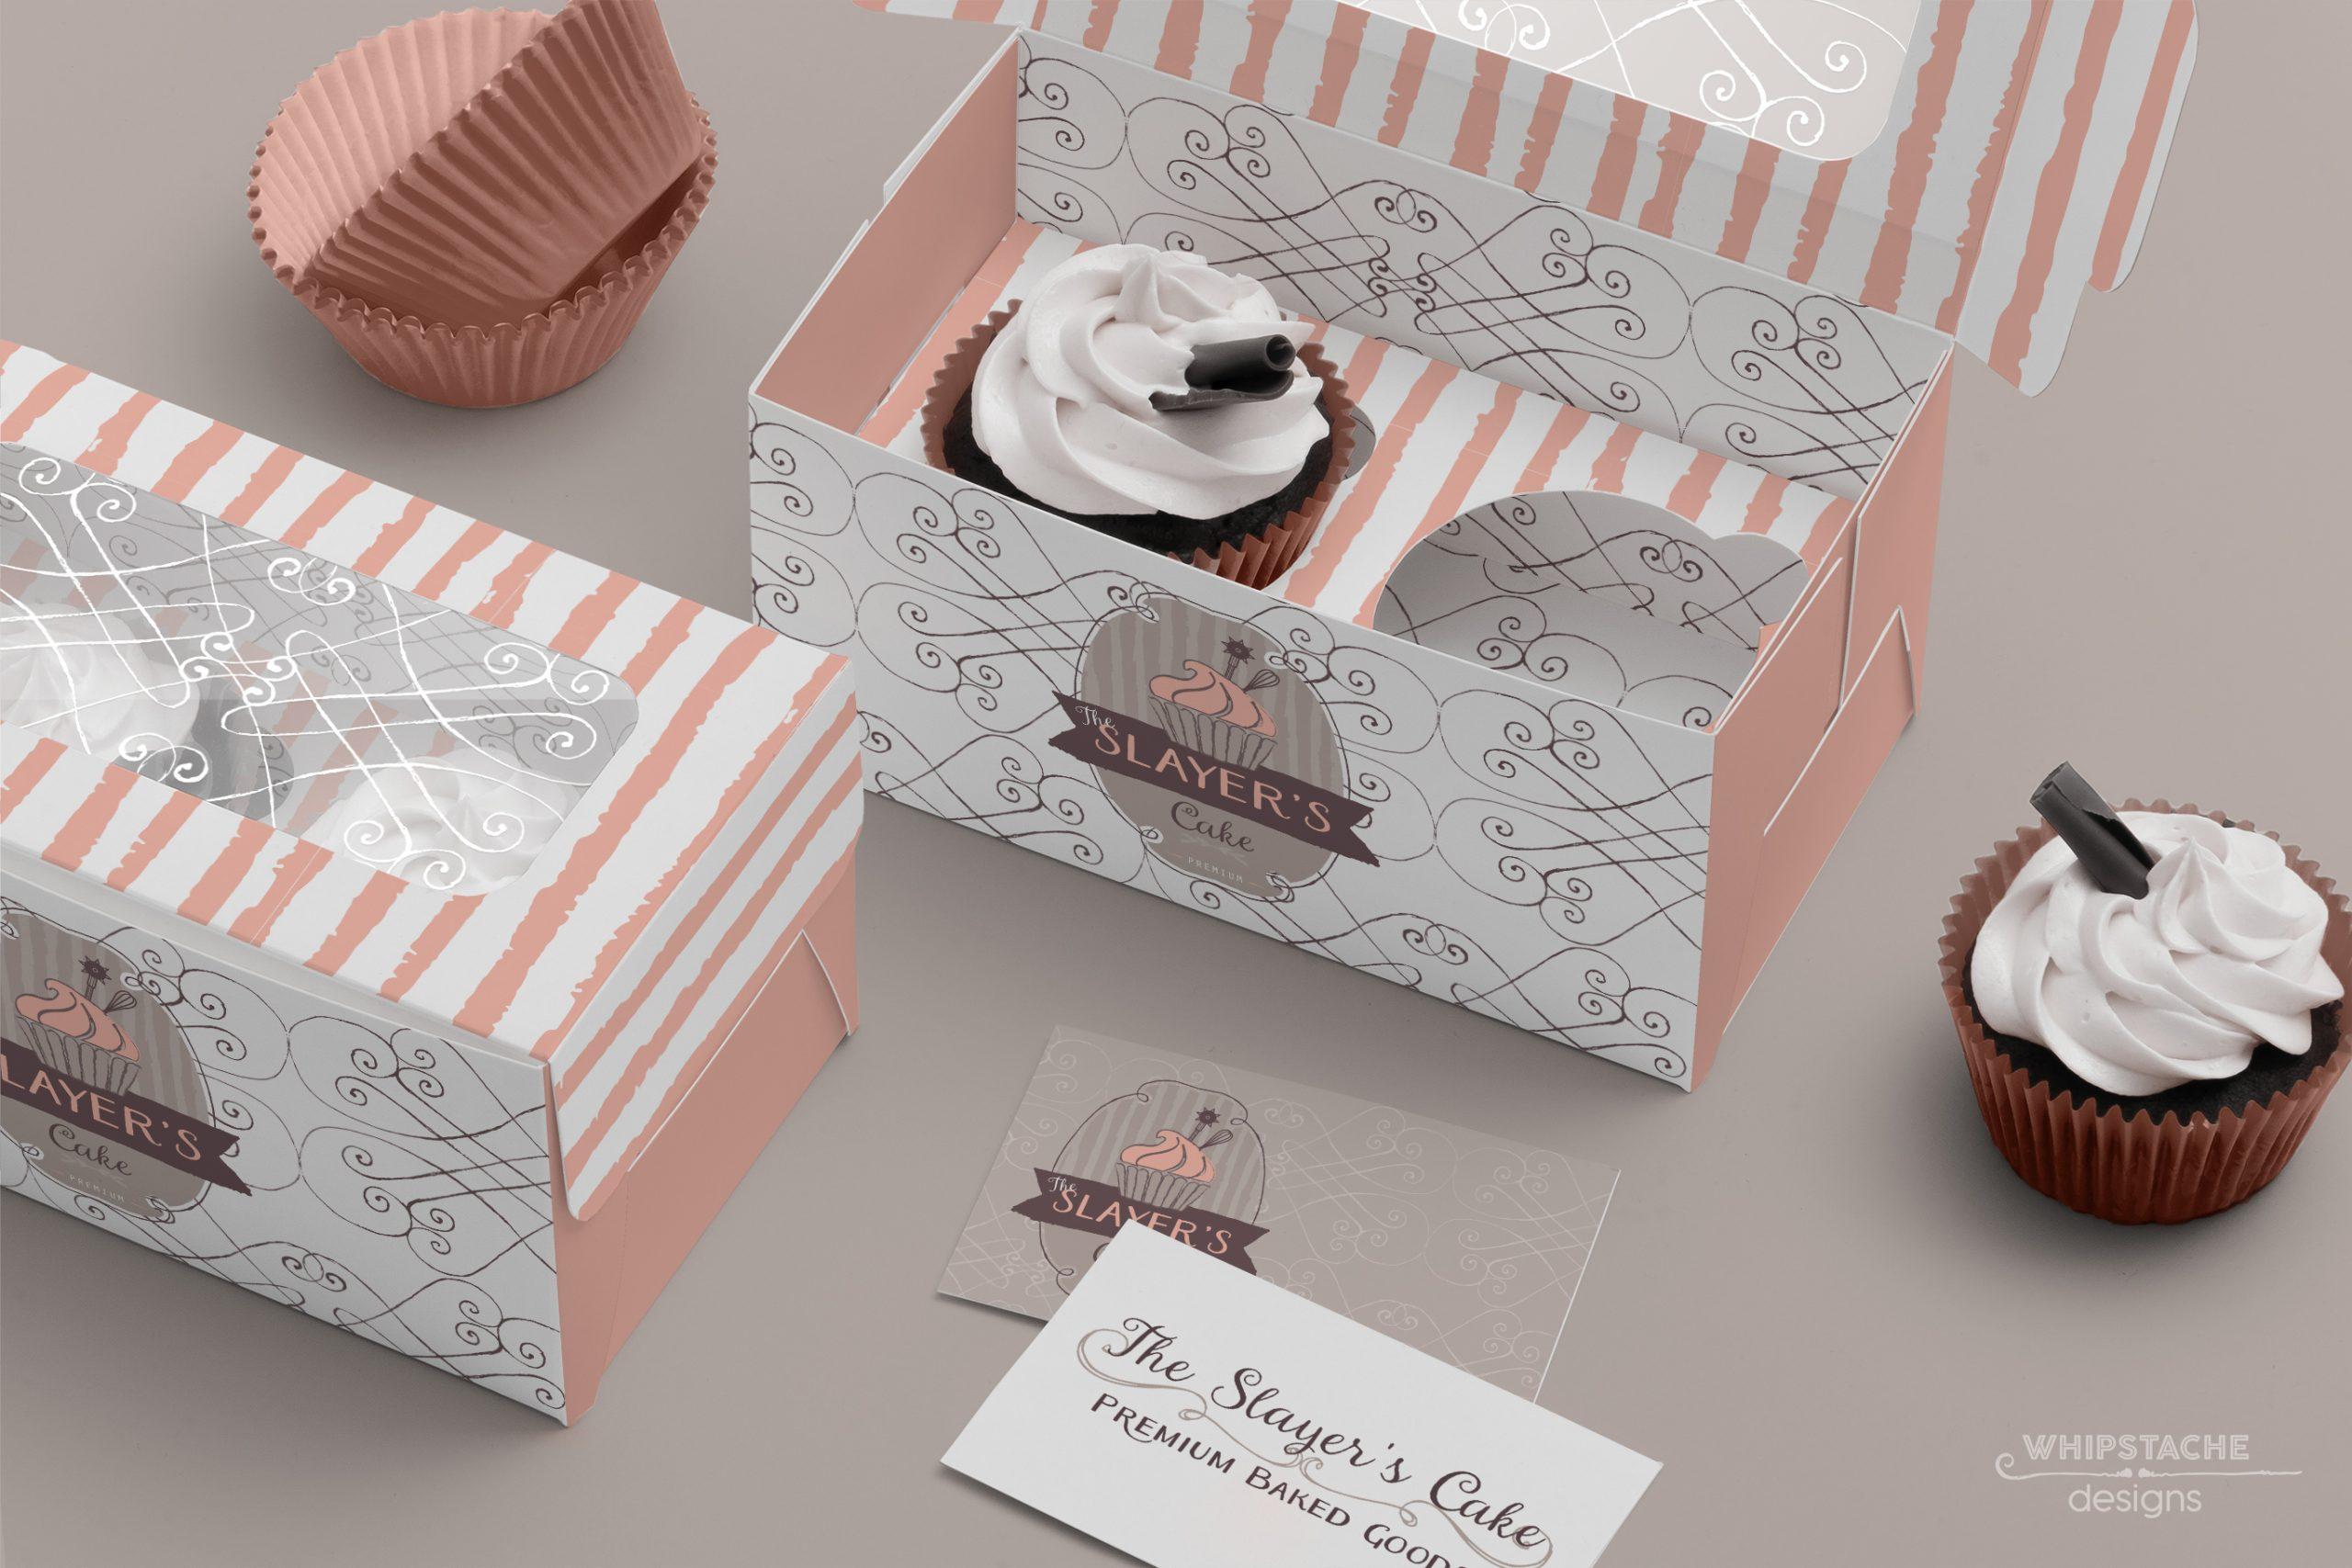 Slayers Cake Two Cupcake Box Mockup@0,5x